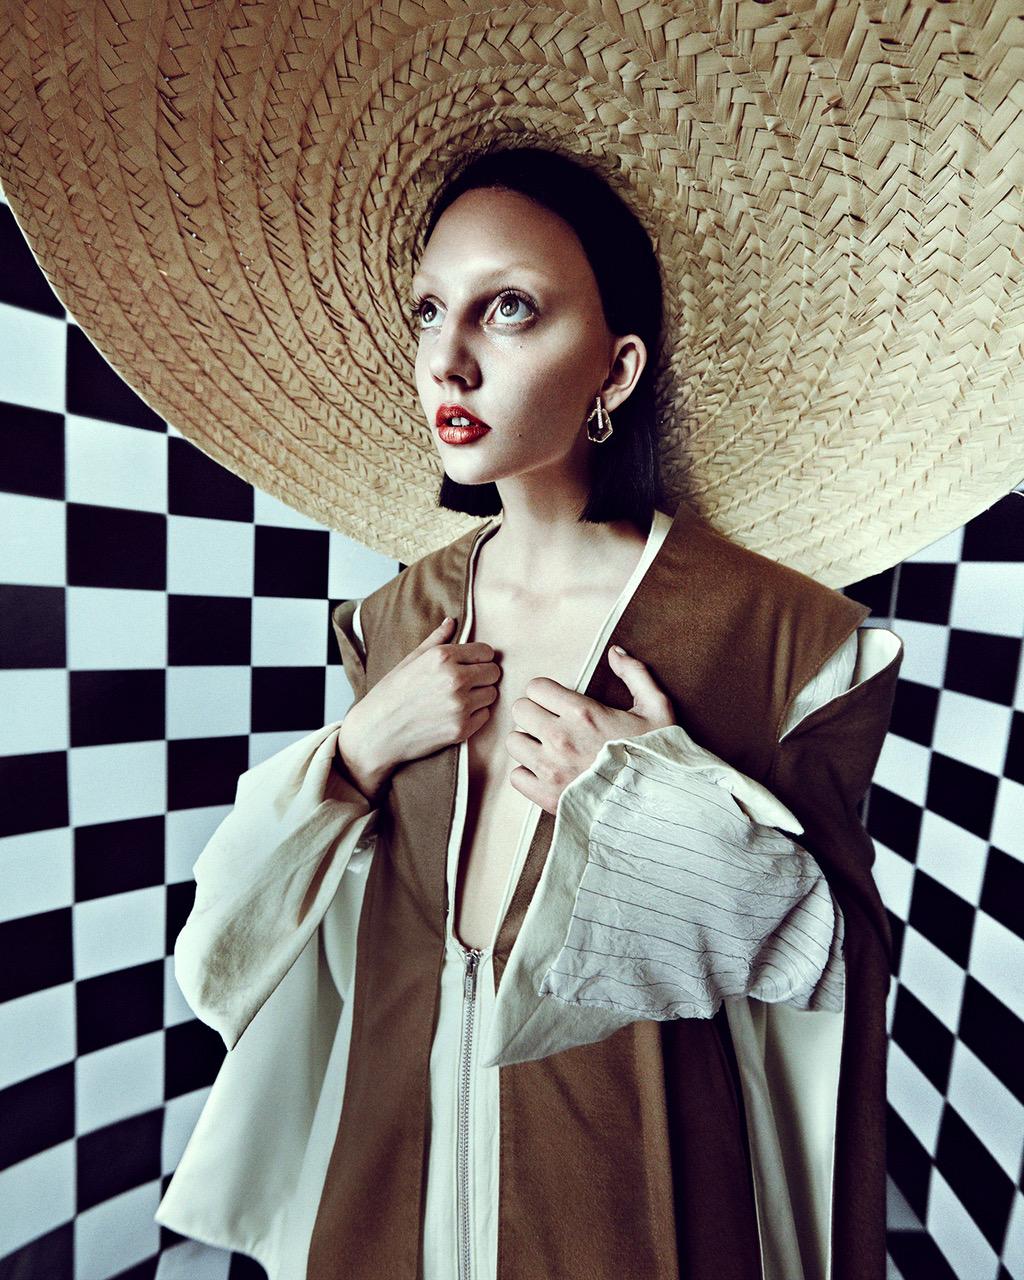 Maison the Faux suit, Mina Ro Mina earrings, hat stylist's own